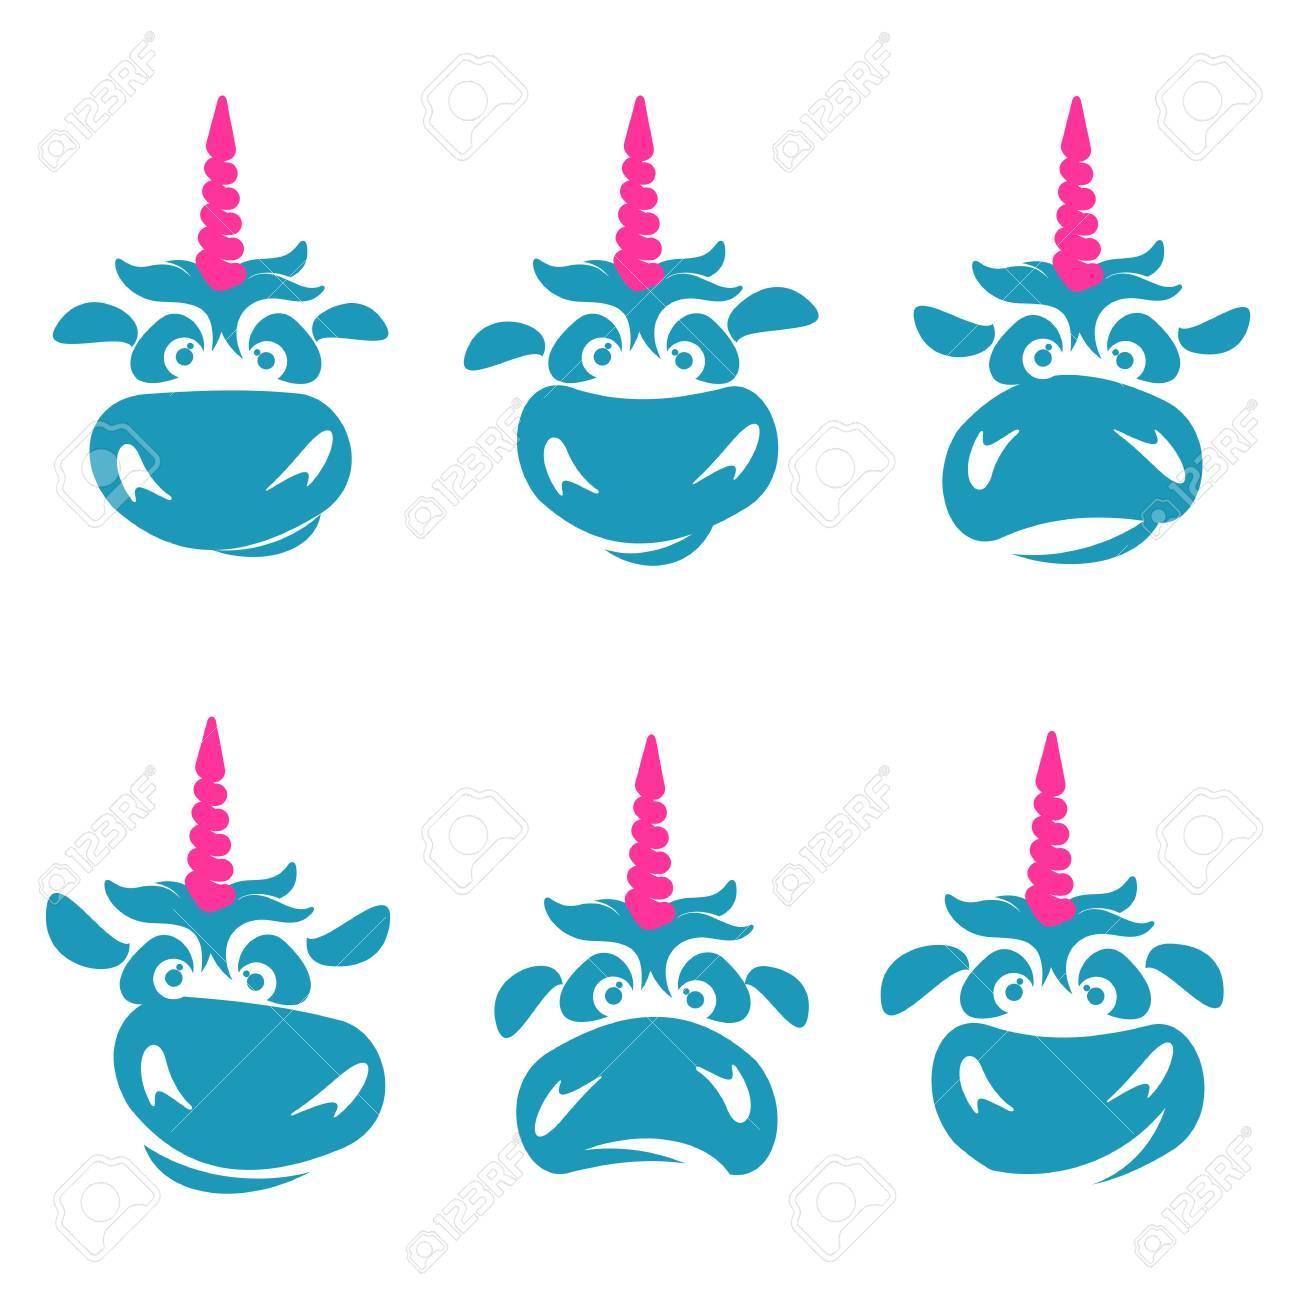 funny unicorn face graphic template full color cartoon unicorn